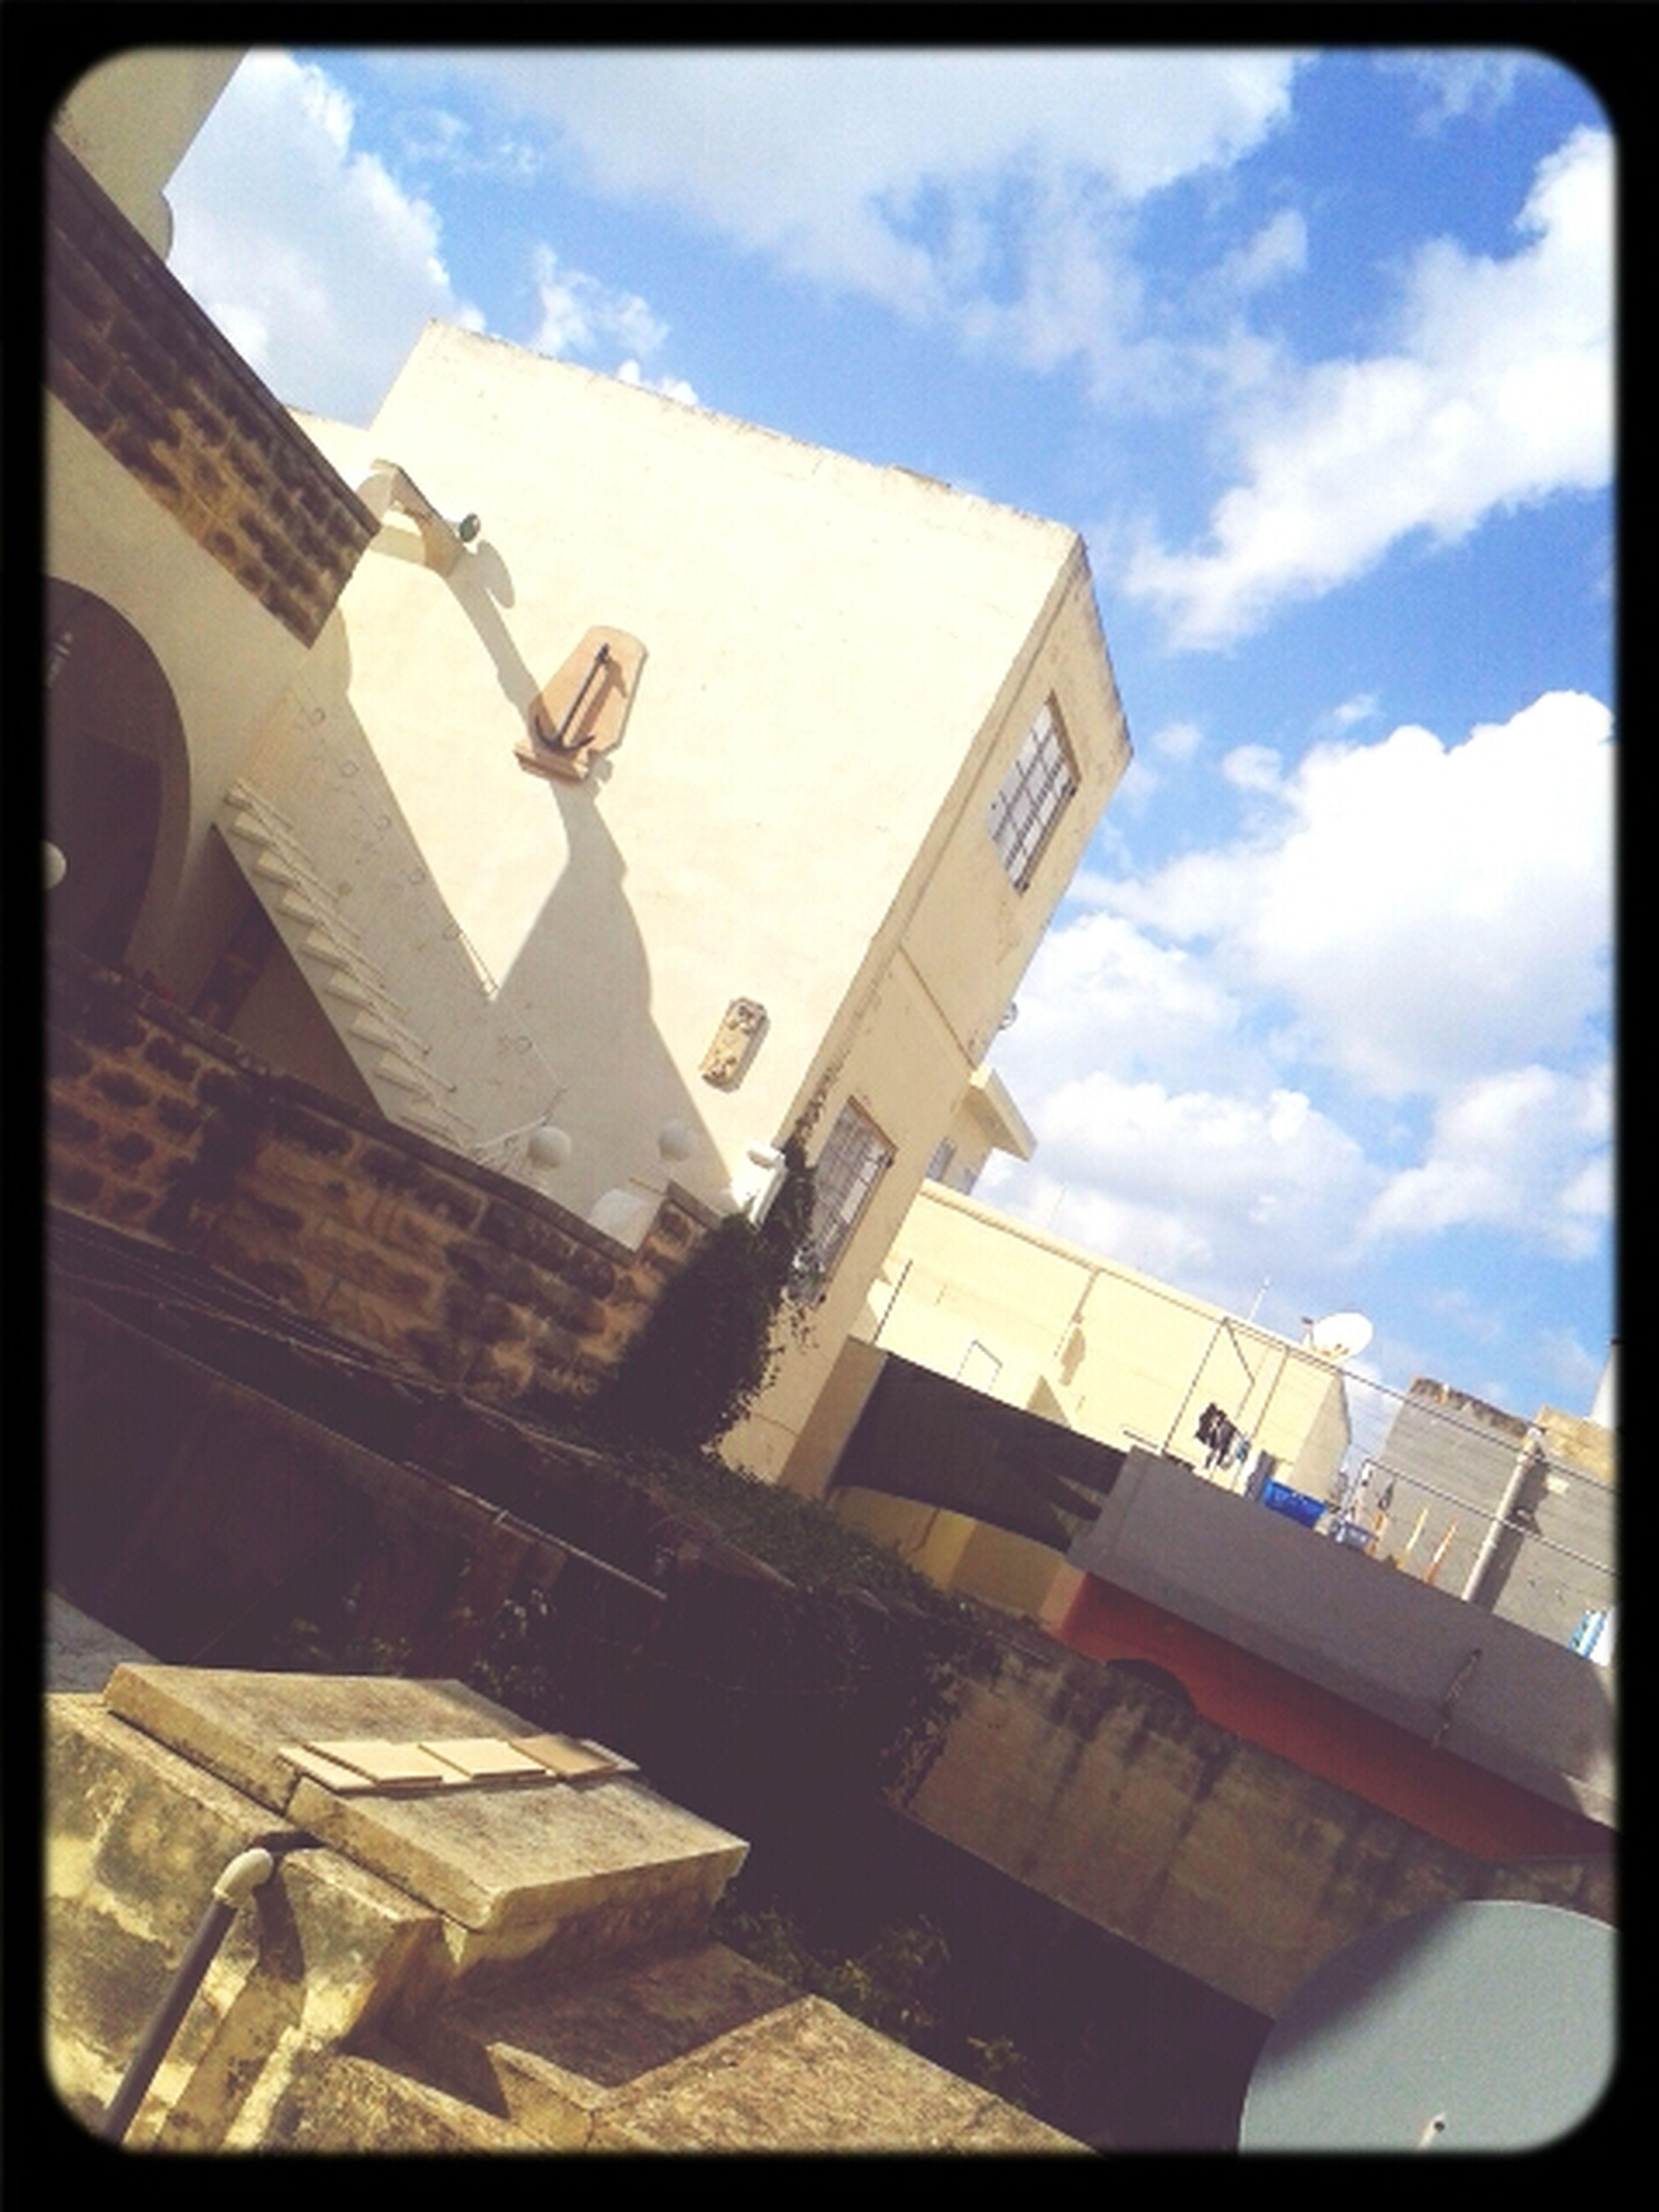 Weather ♥♥ Sunny